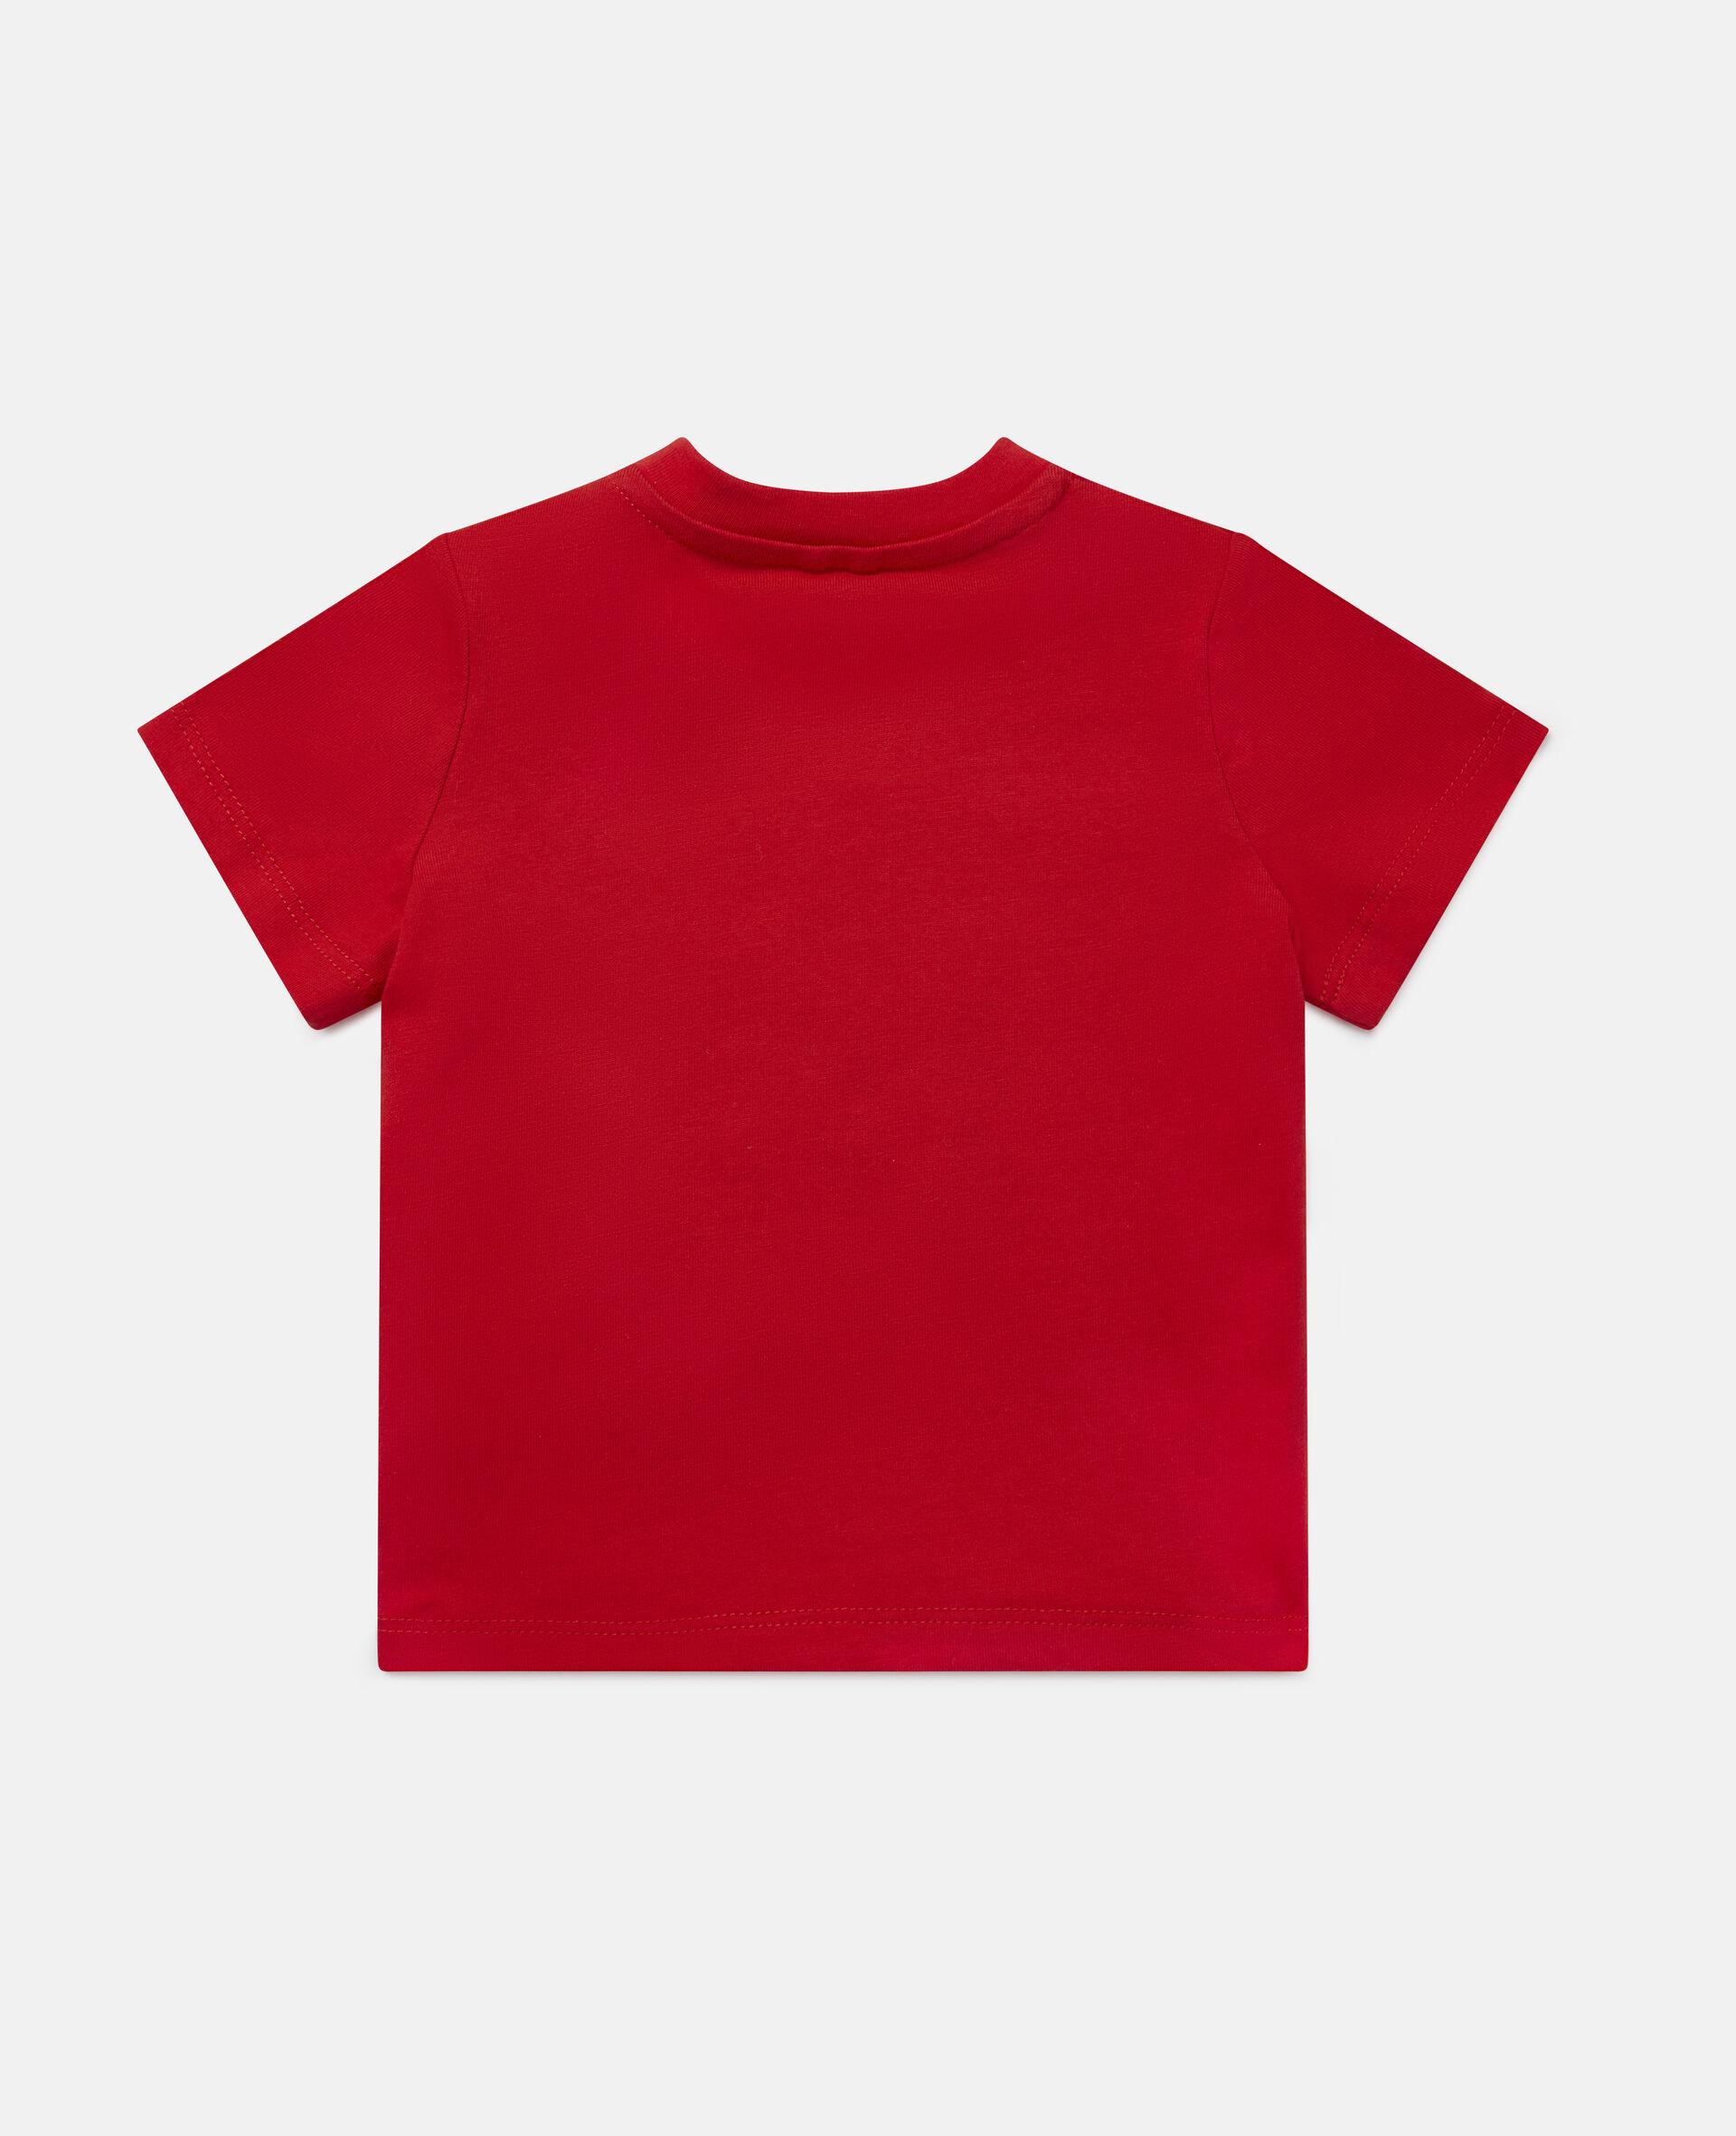 Skateboards Jersey T-Shirt-Red-large image number 3